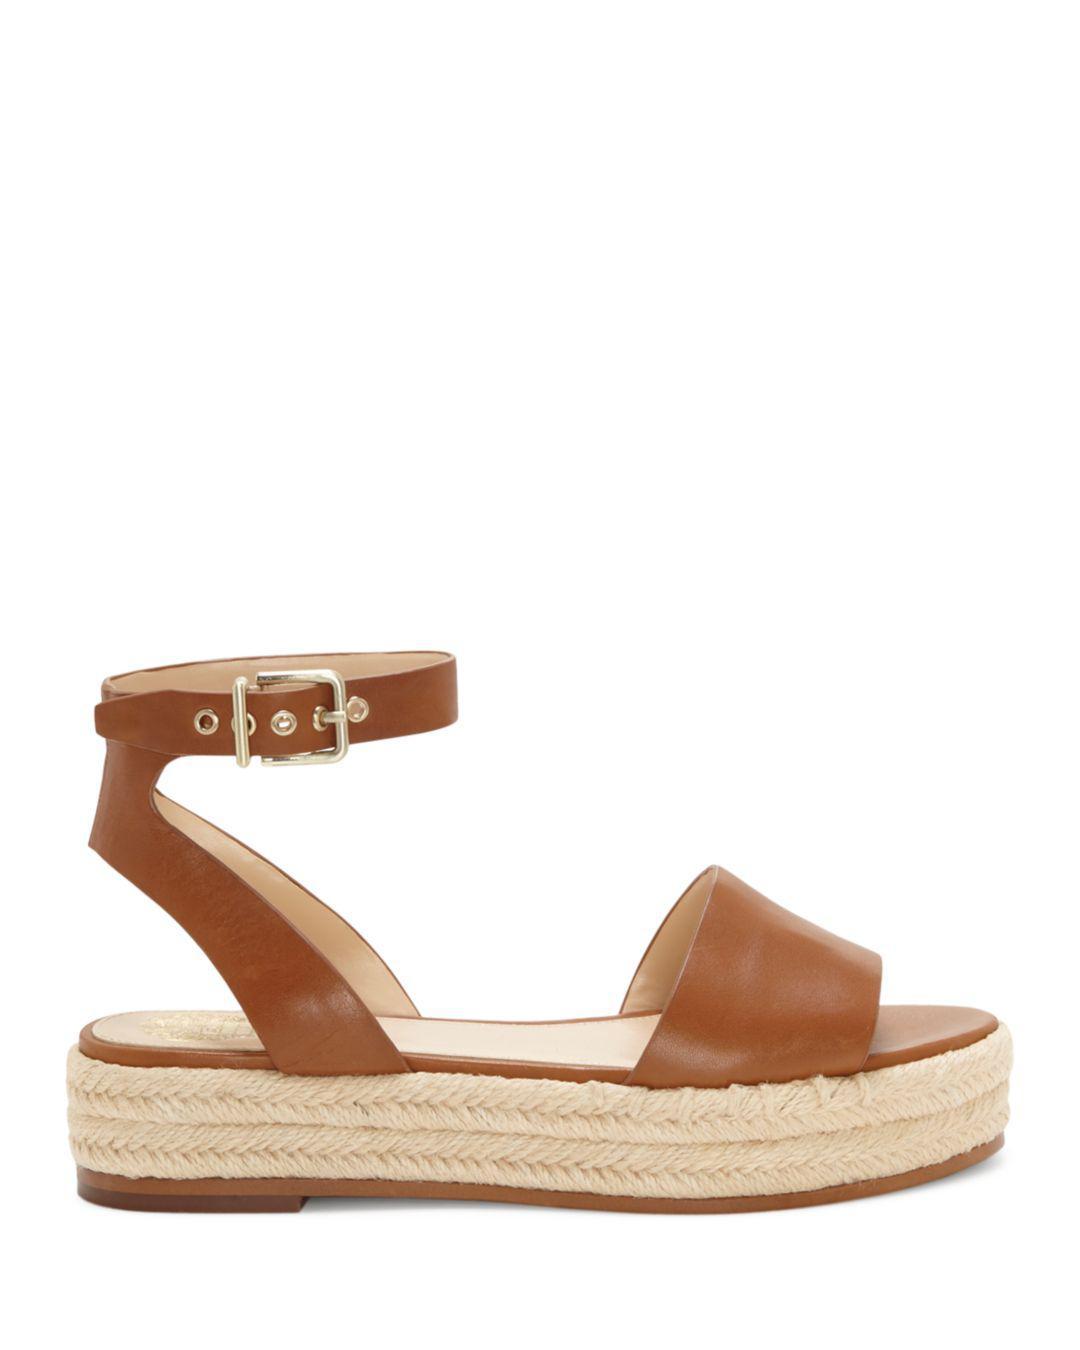 1a555f52325c Vince Camuto Women s Kathalia Leather Platform Espadrille Sandals in ...